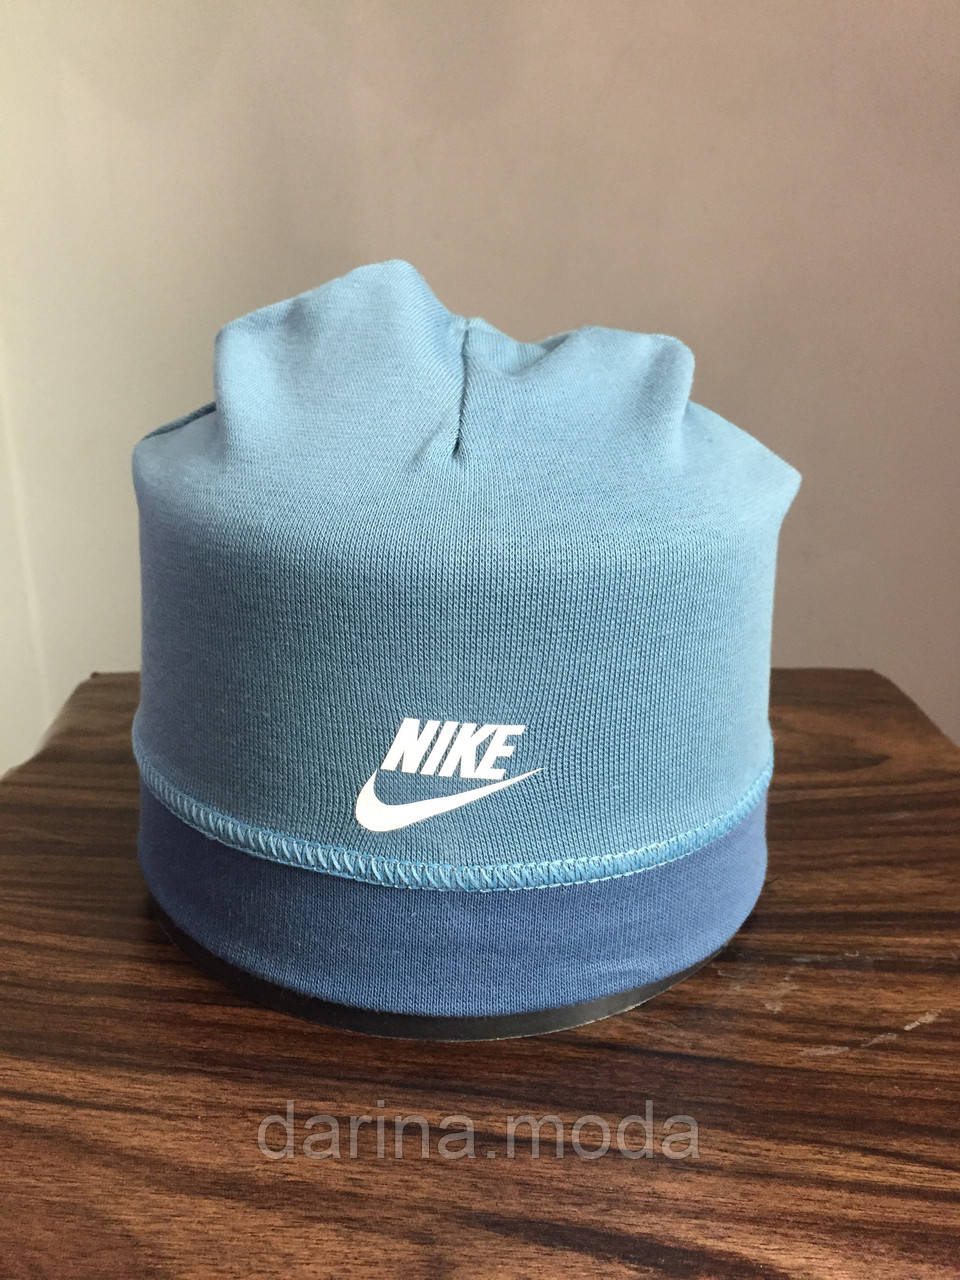 Трикотажная круглая шапочка для мальчика